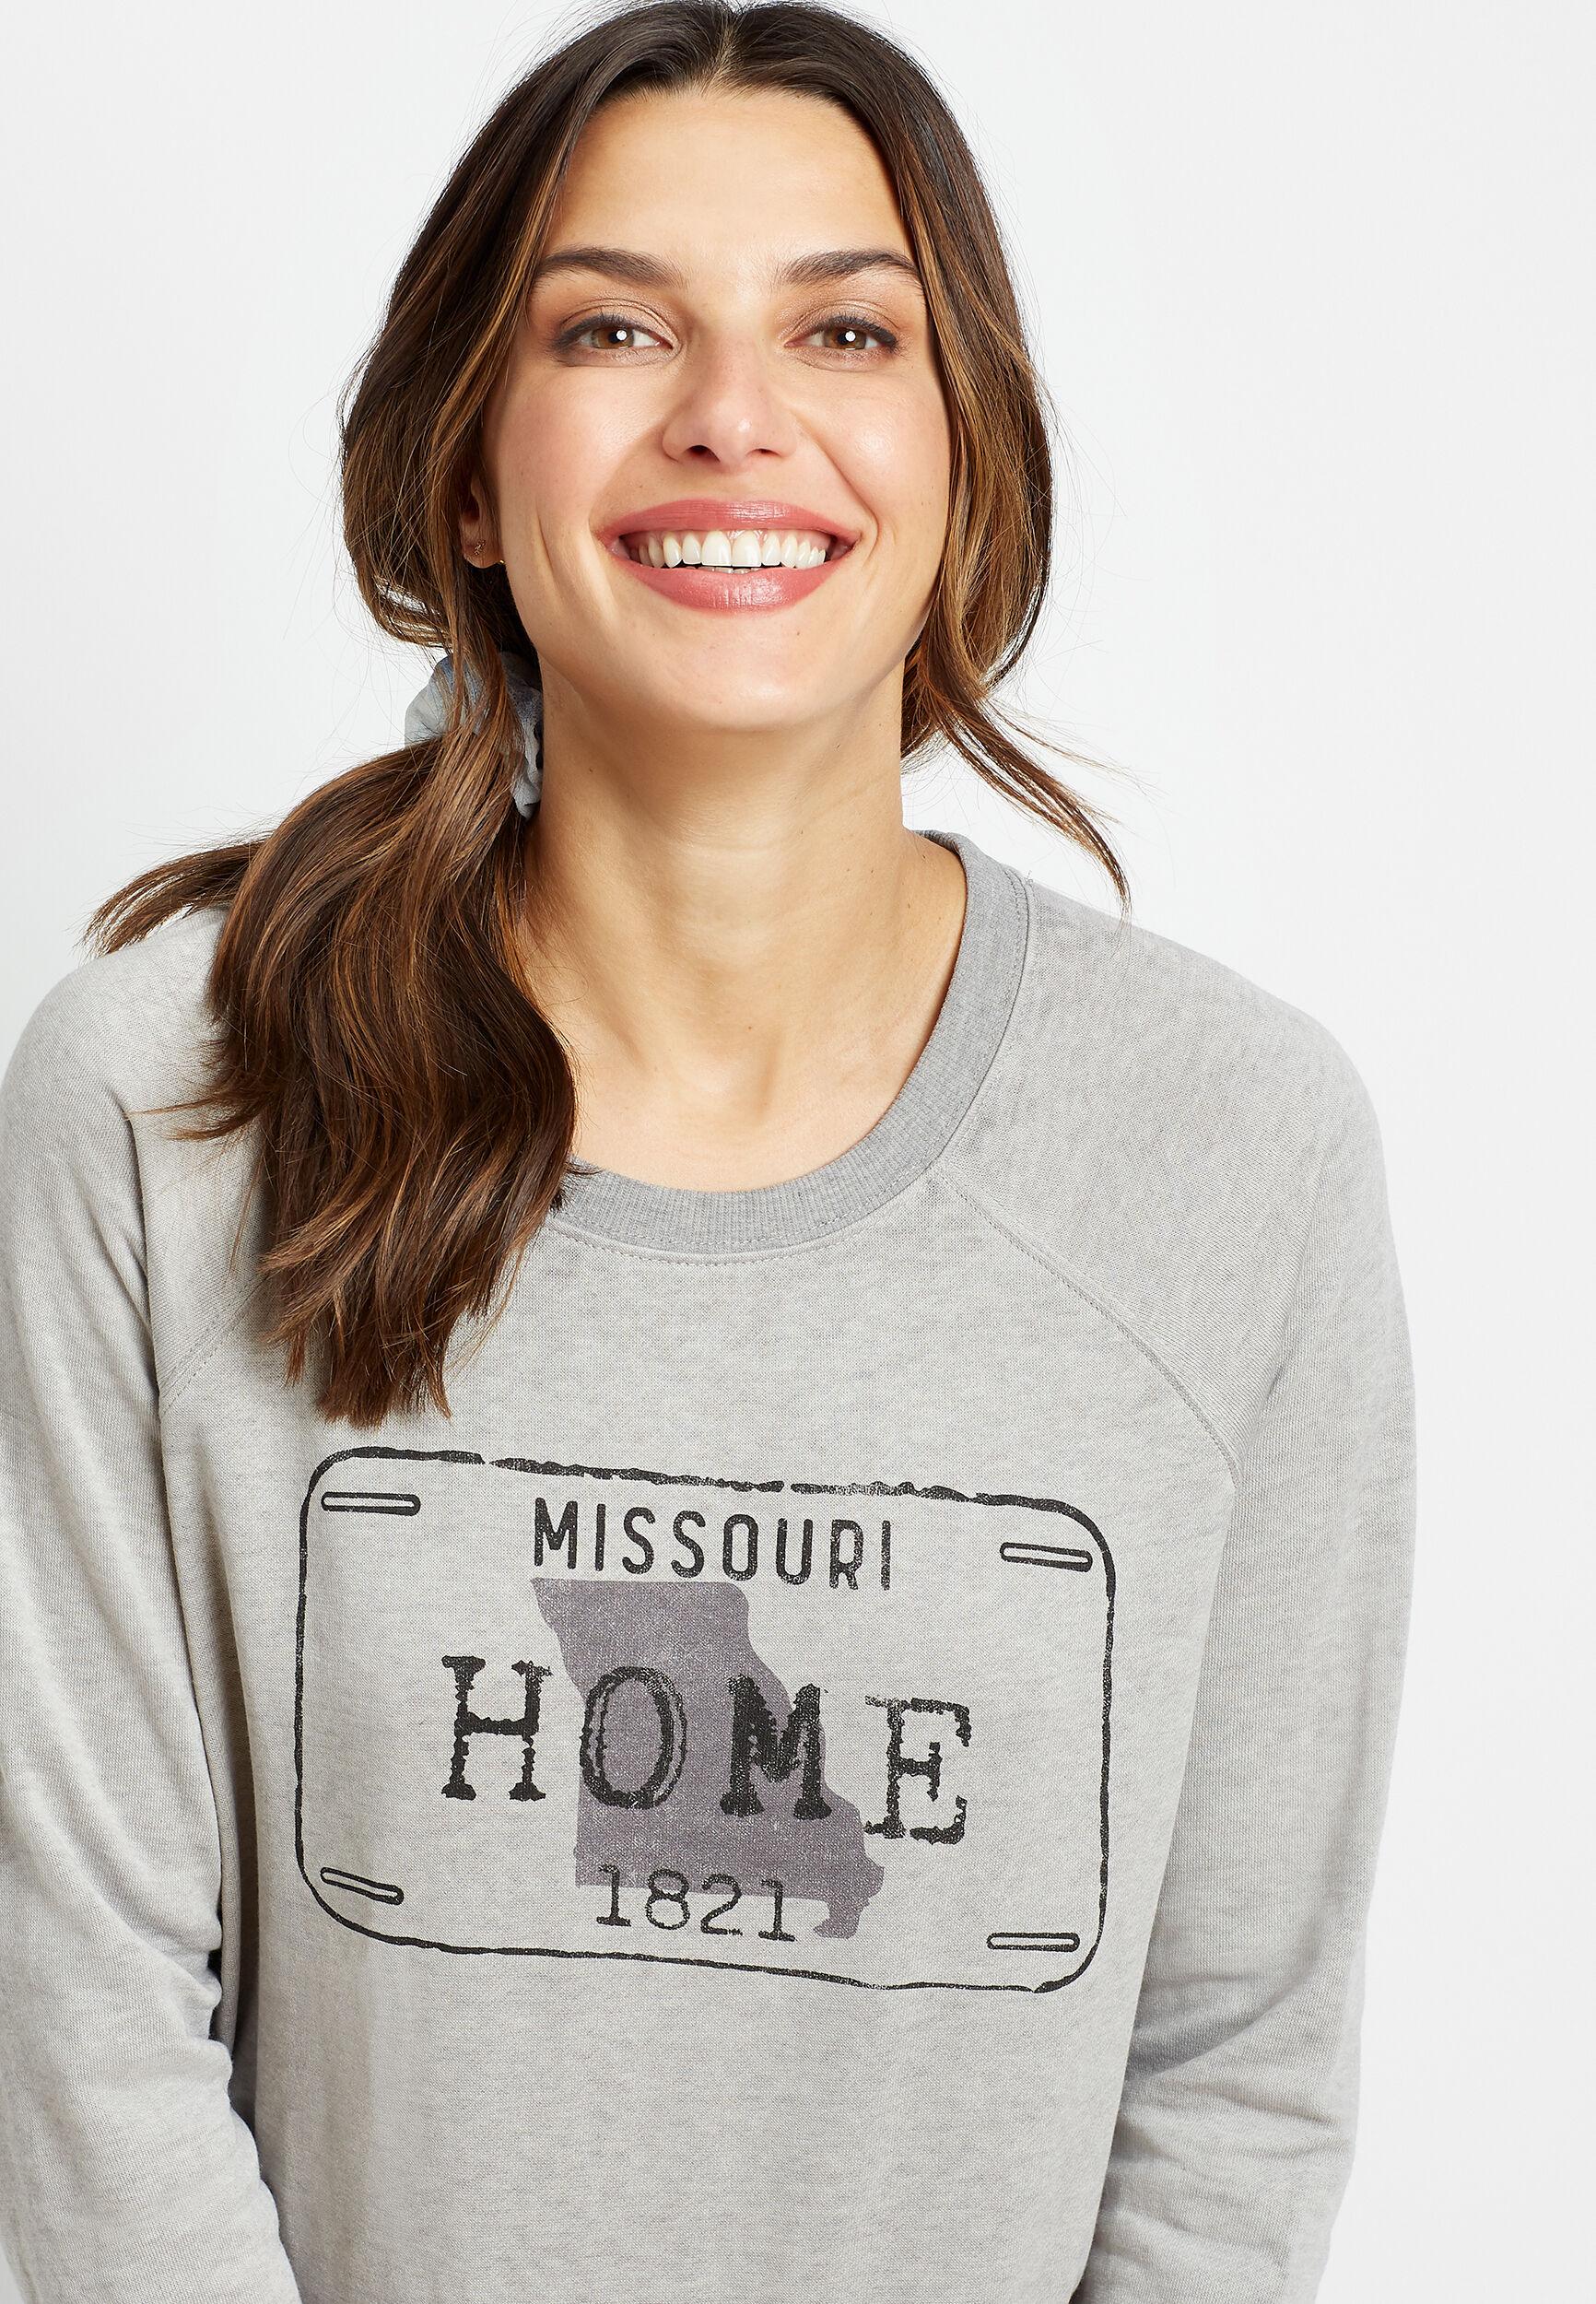 Maurices Womens Gray Missouri Crew Neck Sweatshirt  -  Small